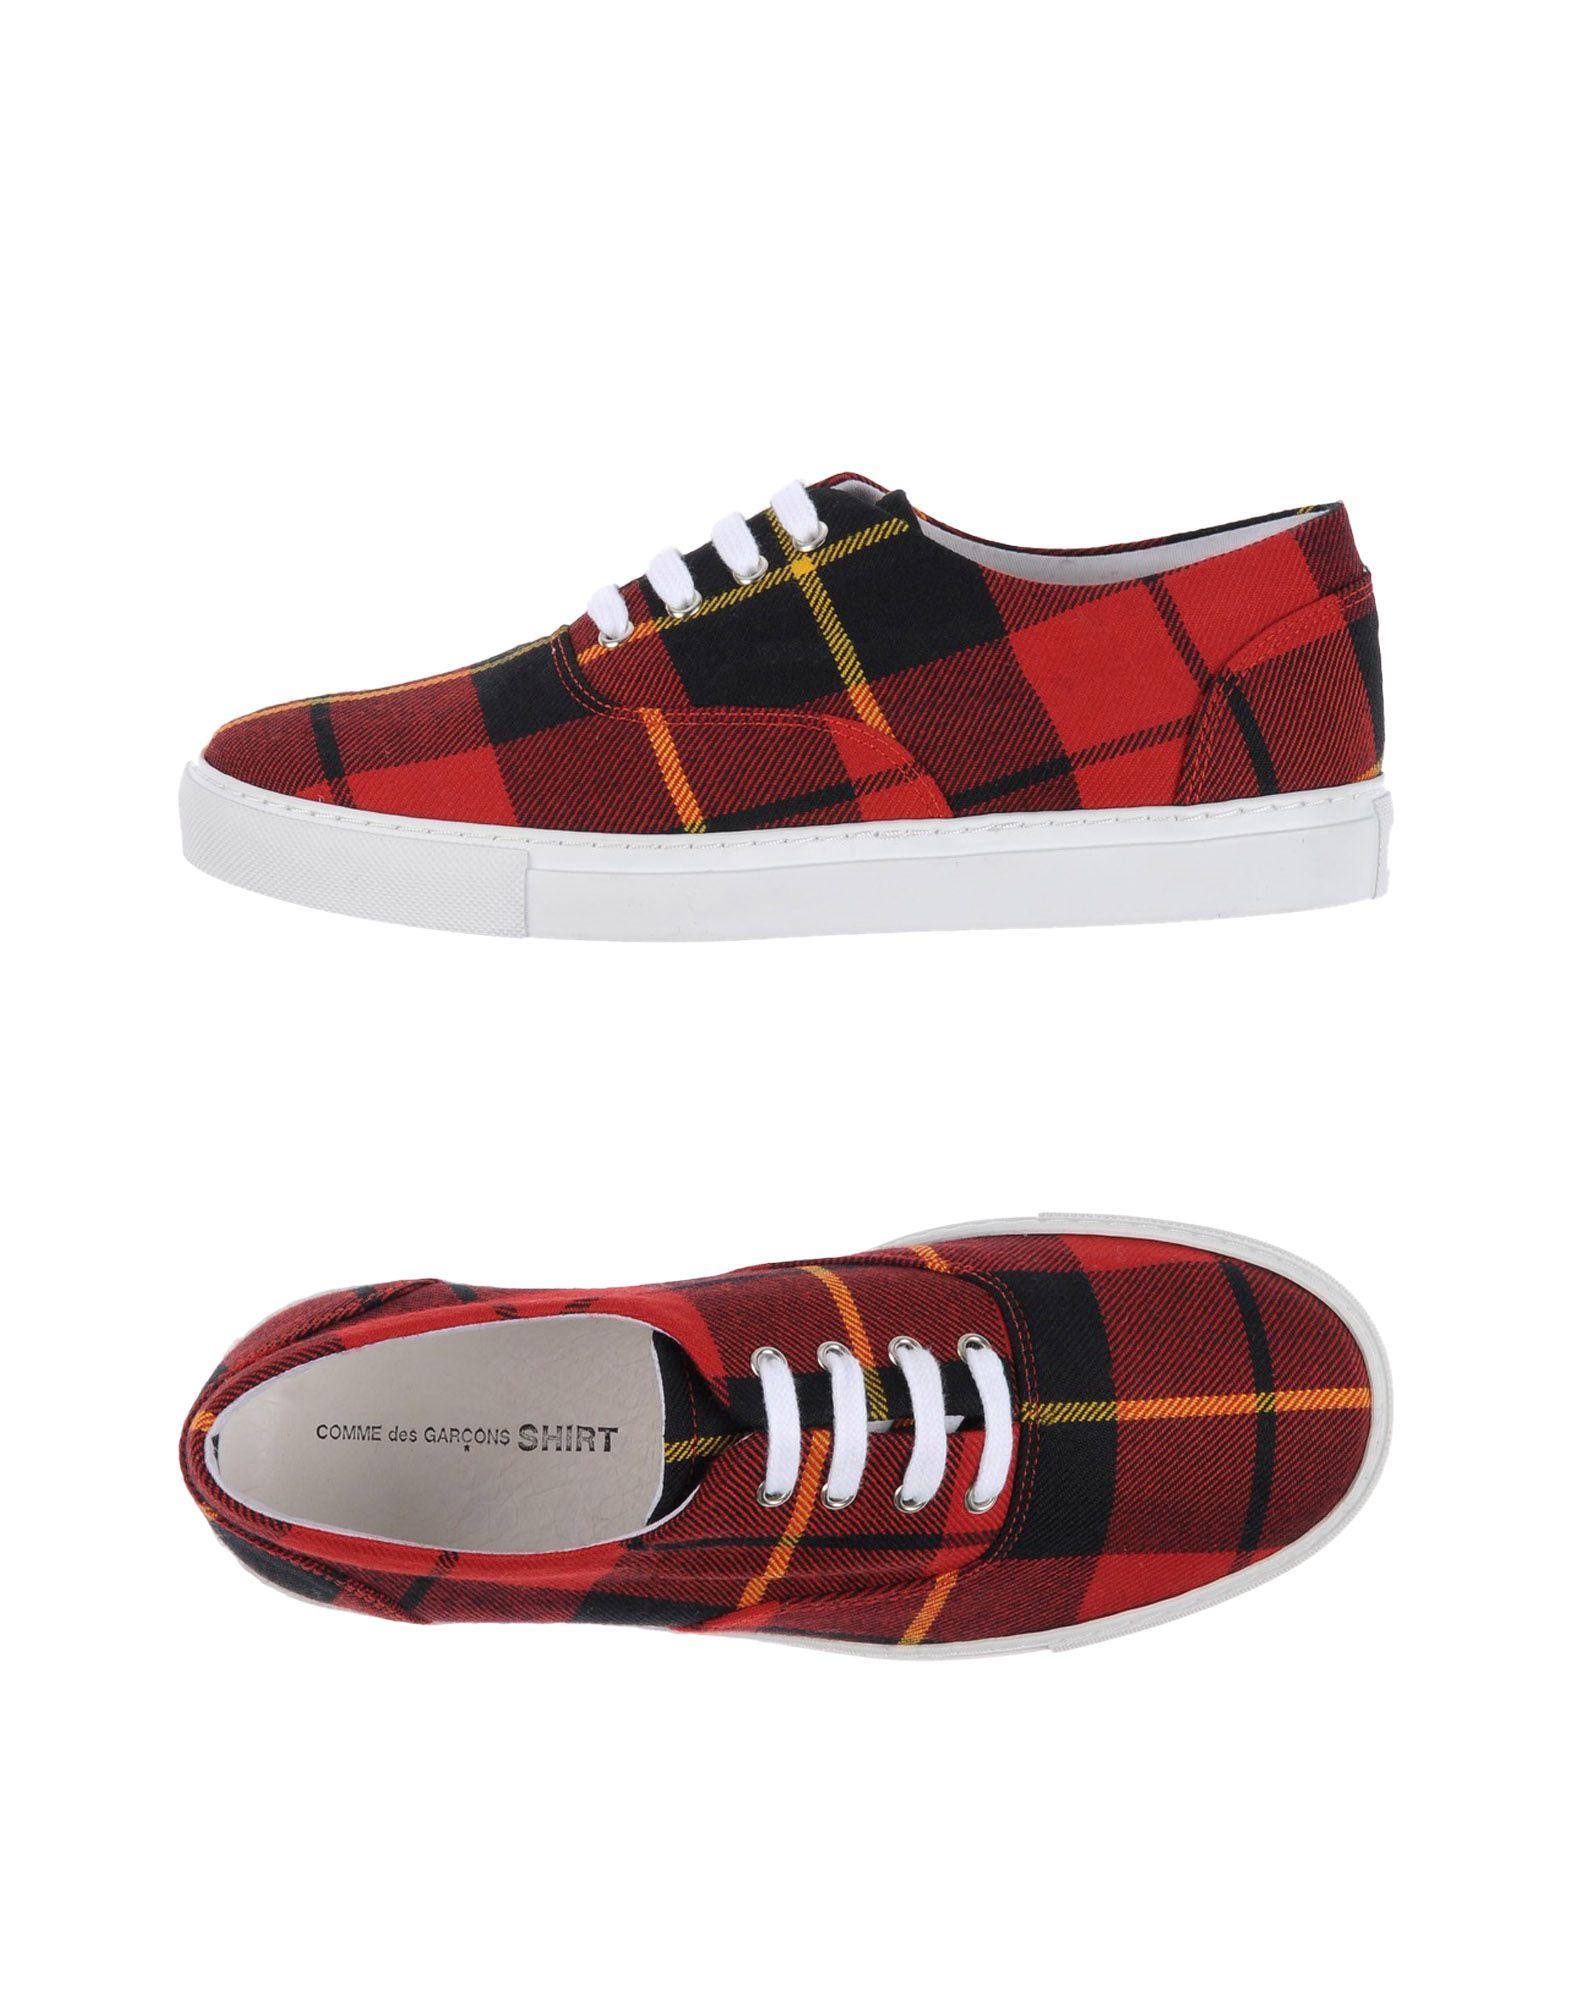 Comme Des Garçons Shirt Sneakers Herren  11129676BU Heiße Schuhe